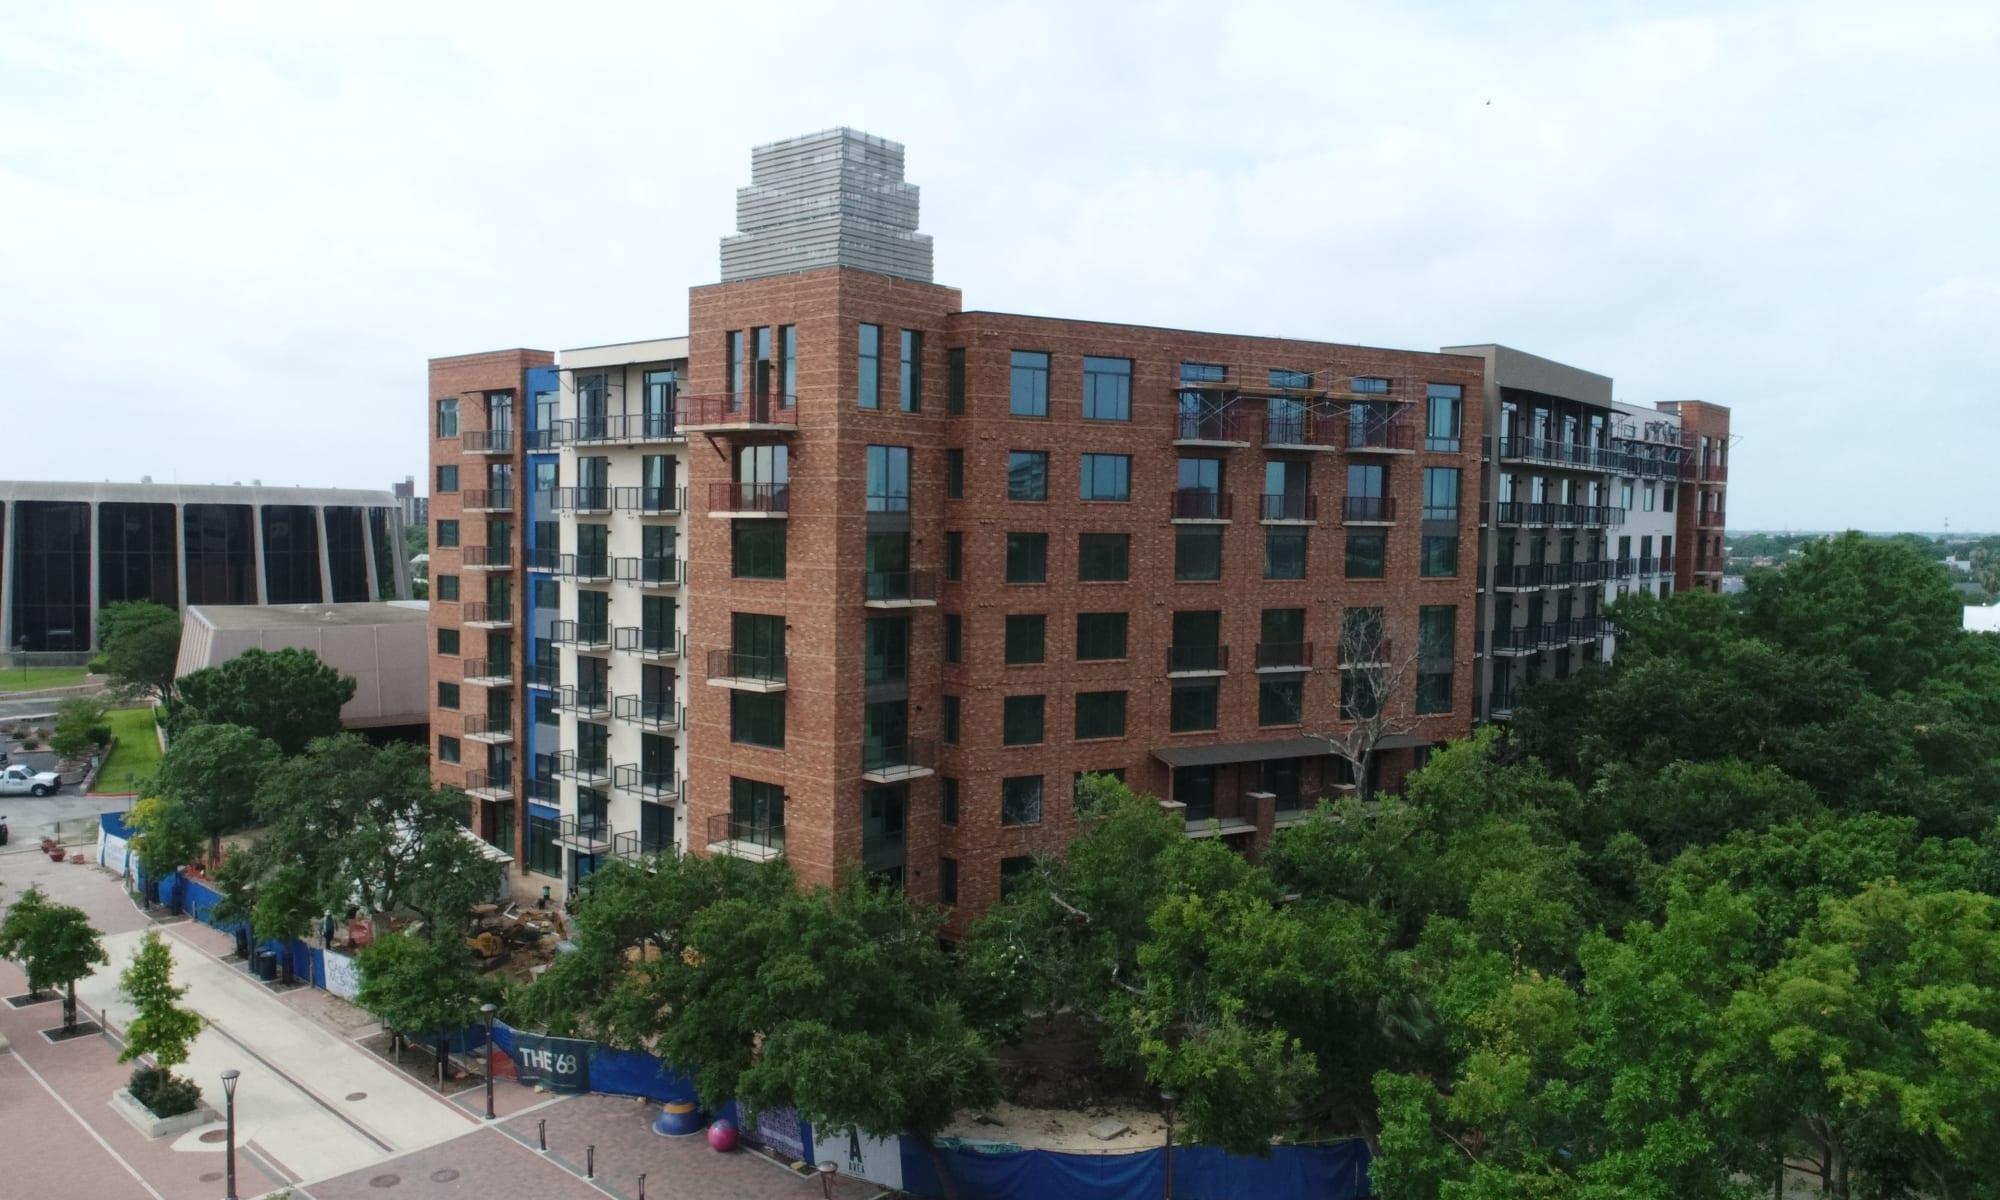 Apartments at The '68 in San Antonio, Texas